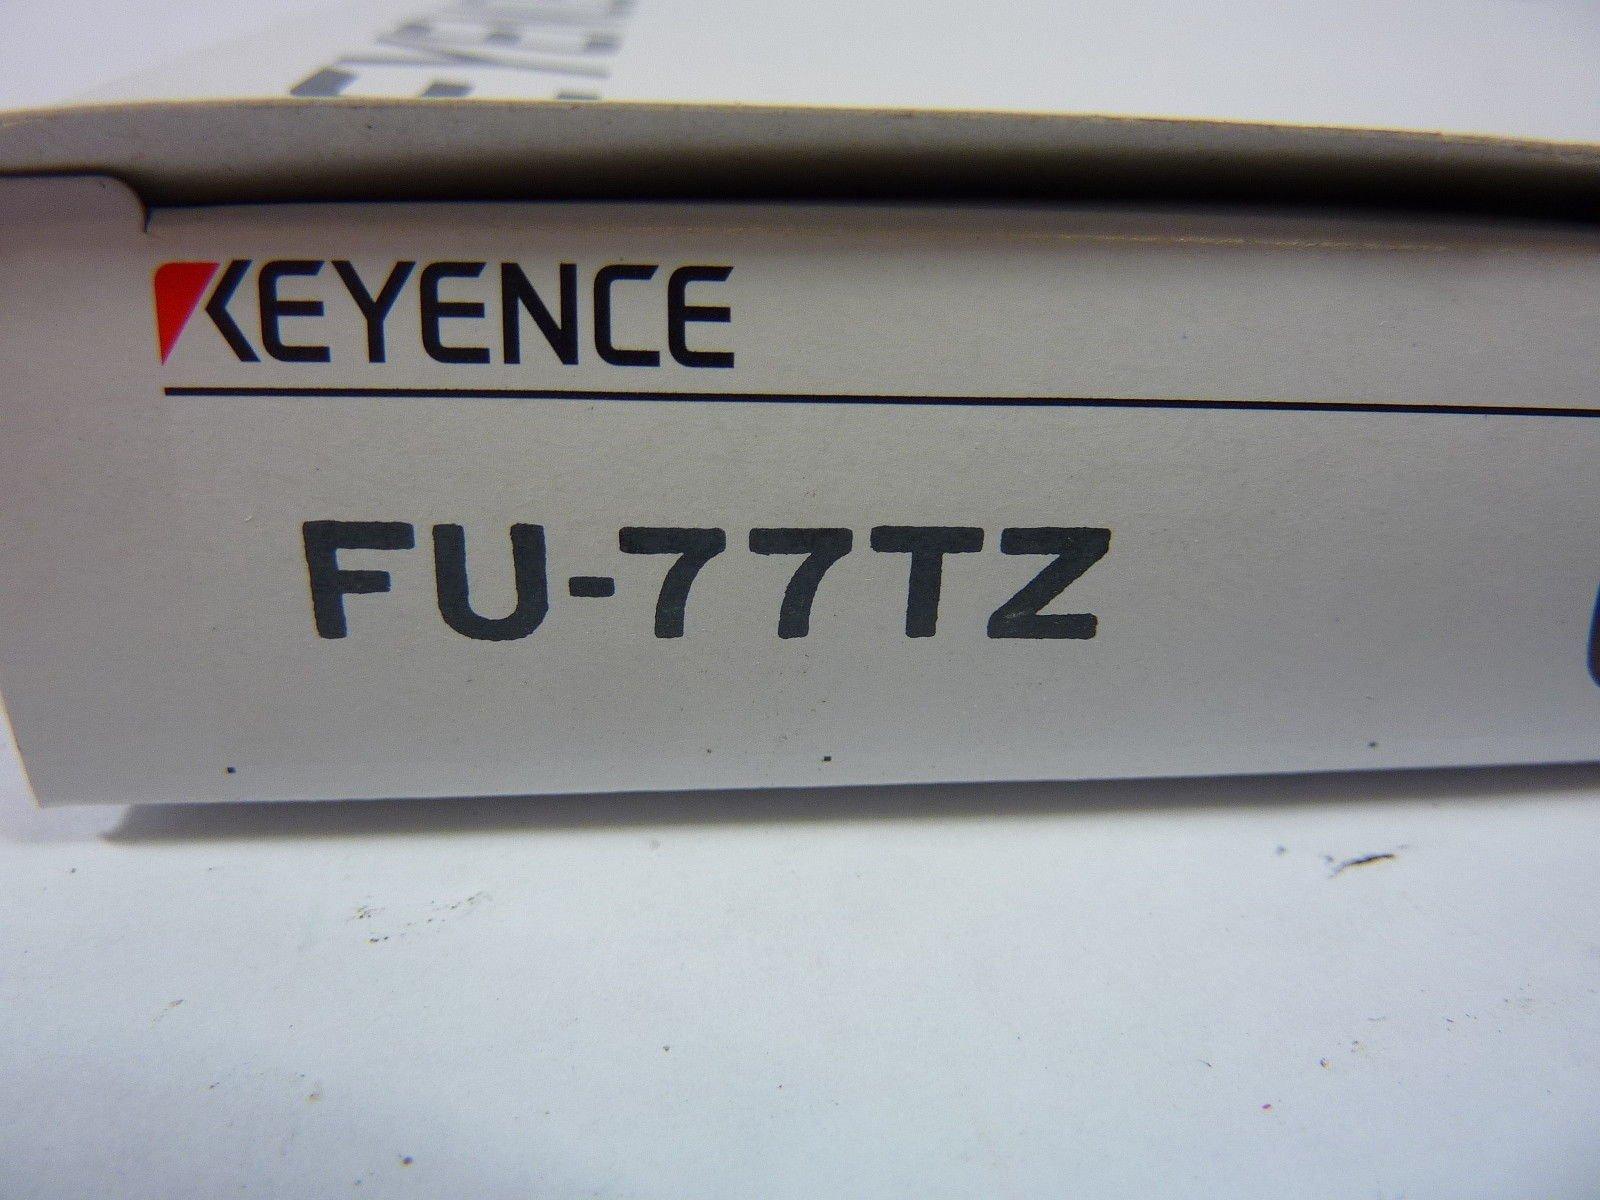 Keyence FU-77TZ Fiber Optic Cable 80 Inches FU77TZ W/ FU Cutter